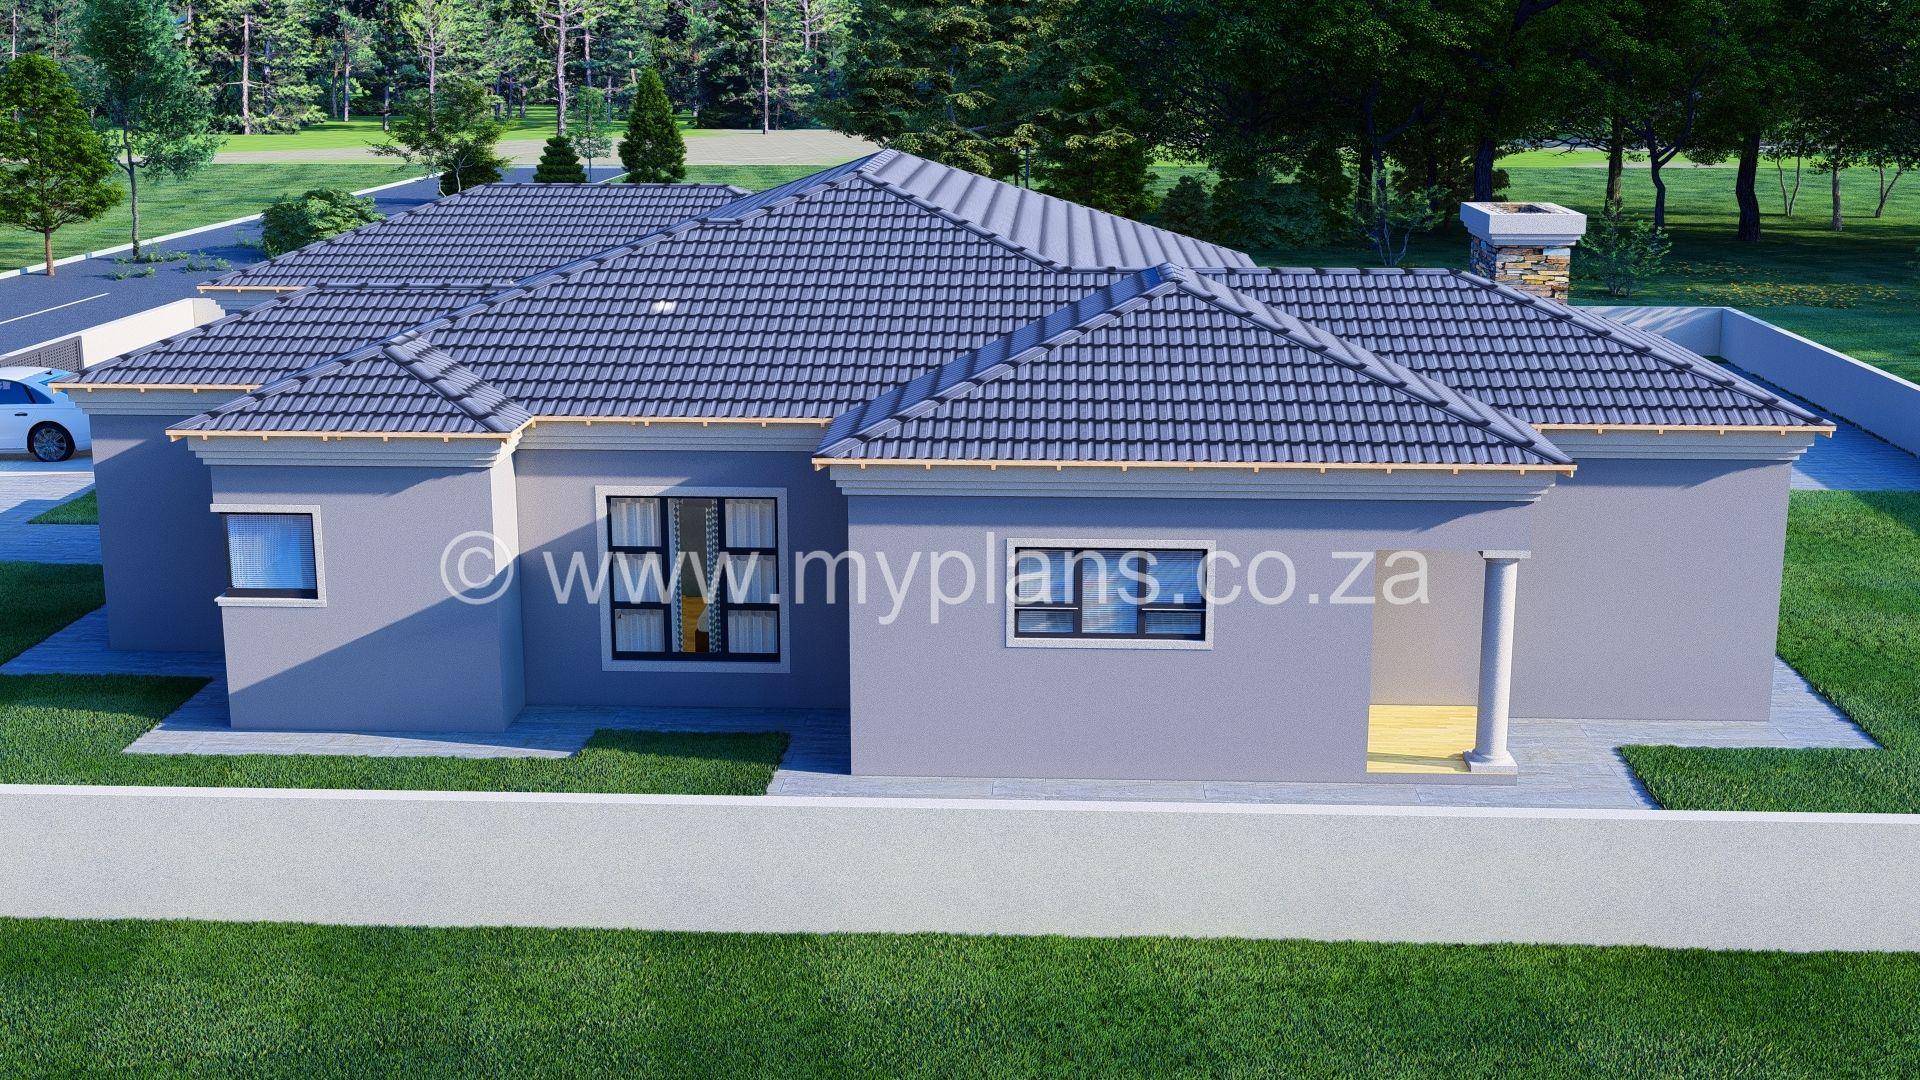 3 Bedroom House Plan Mlb 069s In 2020 Bedroom House Plans House Plans South Africa My House Plans